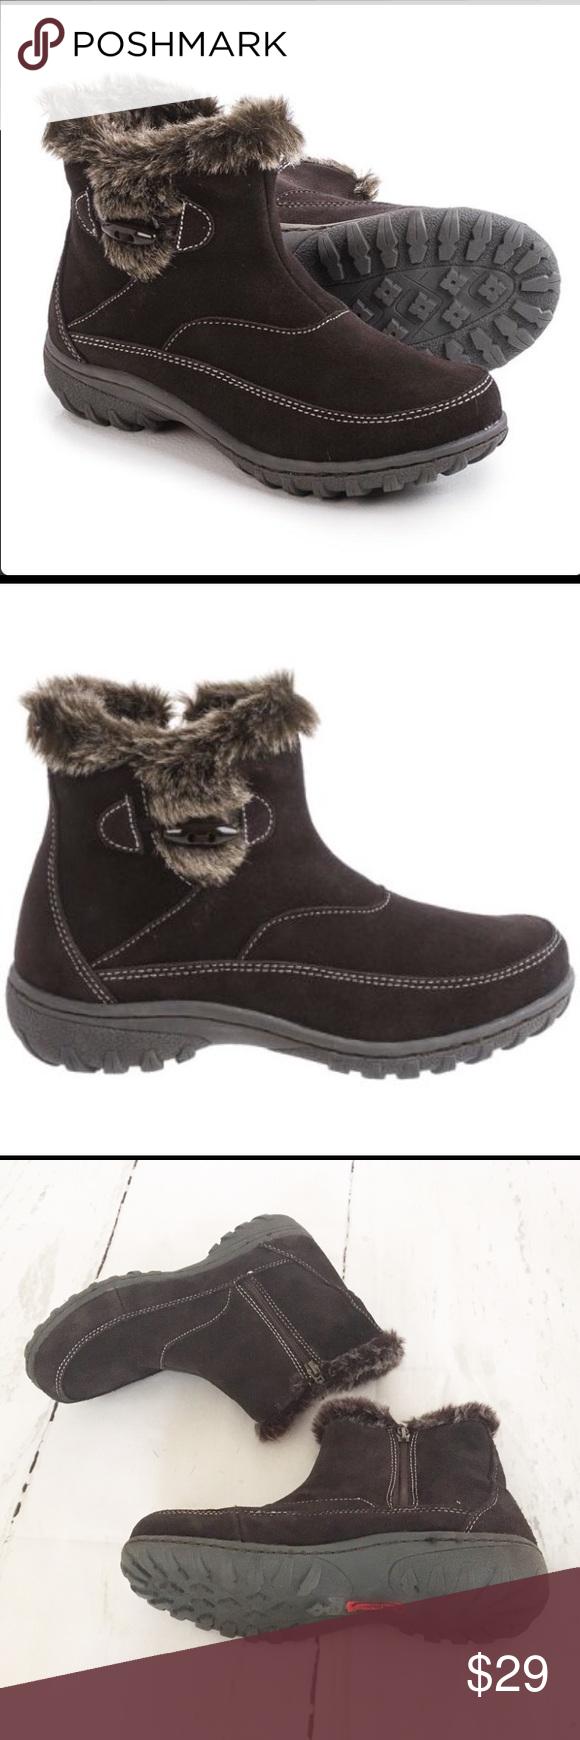 7c393b20866 Khombu Gracie Chocolate Brown Boots Size 9 Khombu Gracie Chocolate Brown Boots  Size 9. Selling